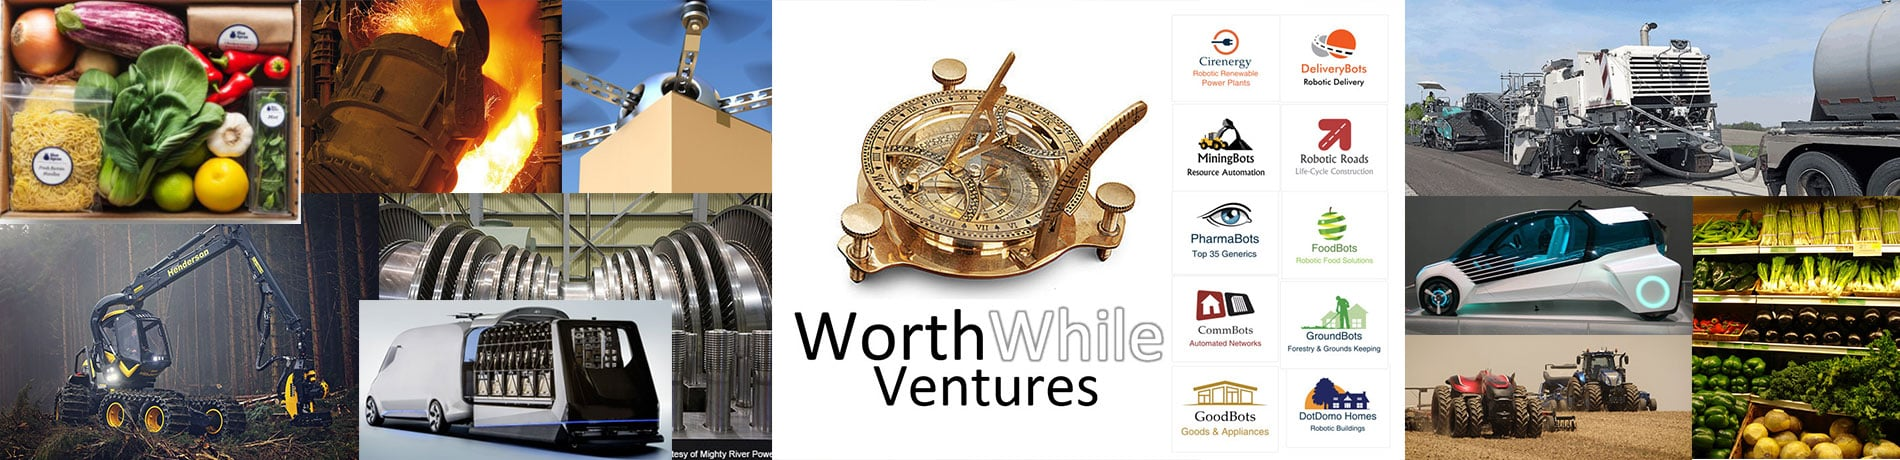 Worthwhile-banner-1